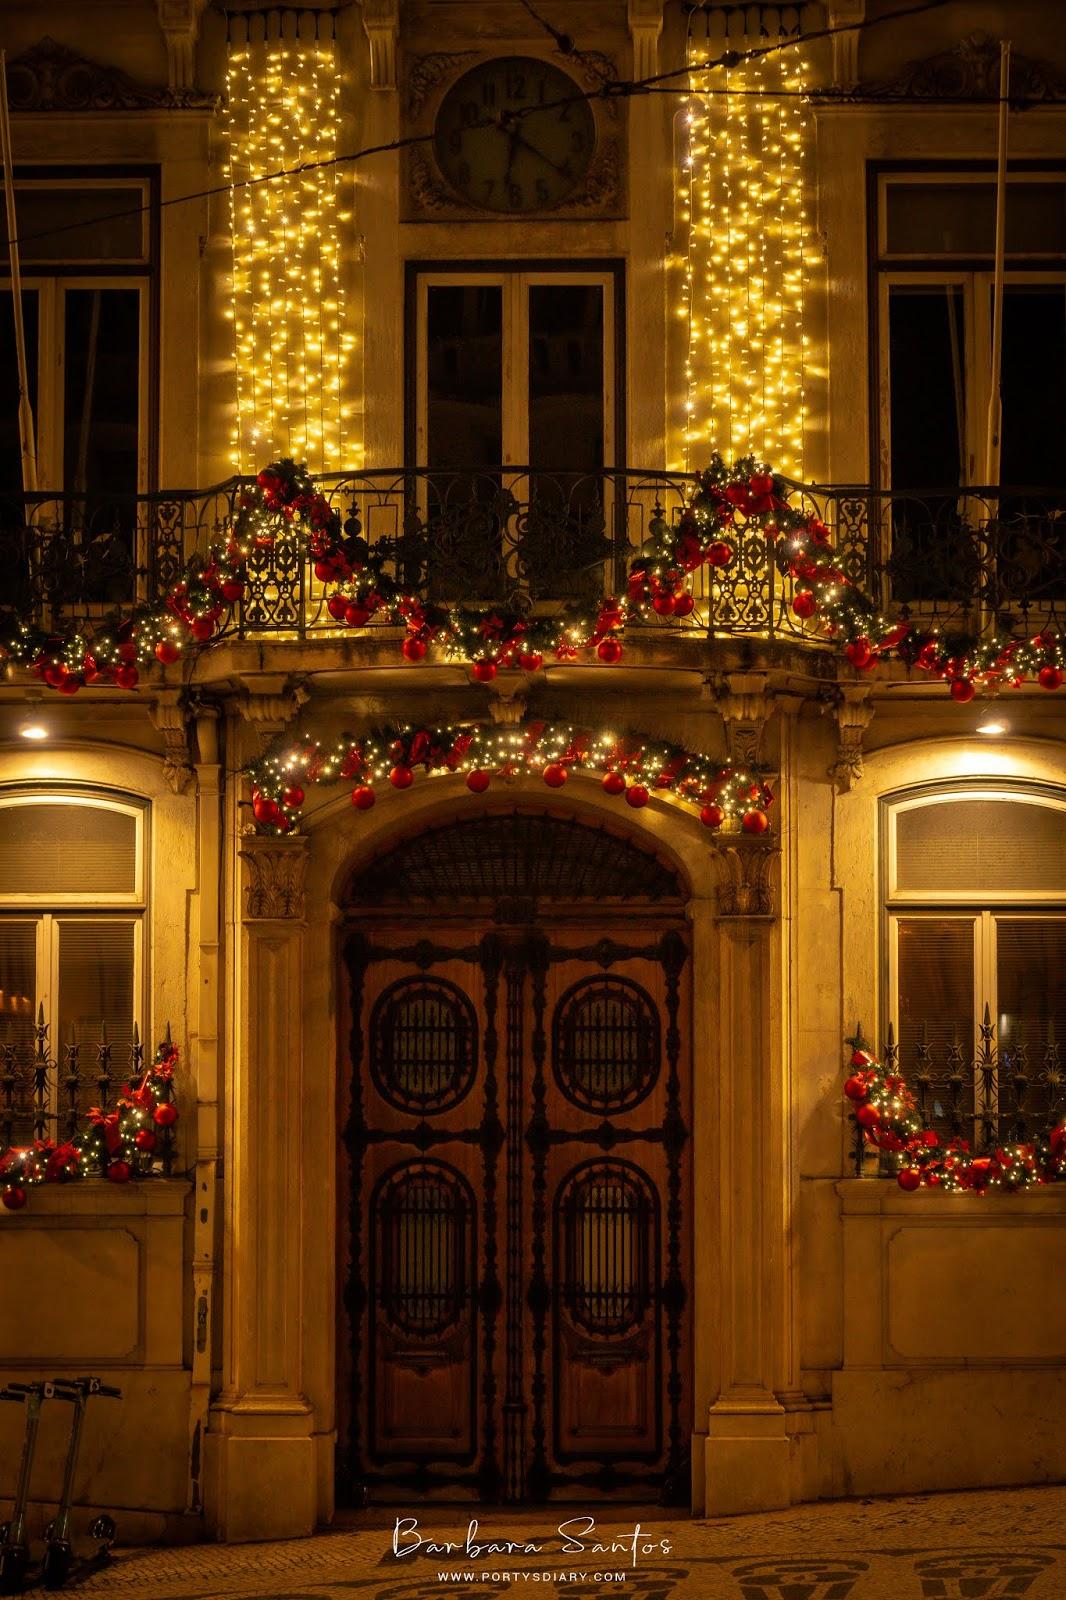 Largo do Chiado - Christmas Decorations in Lisbon